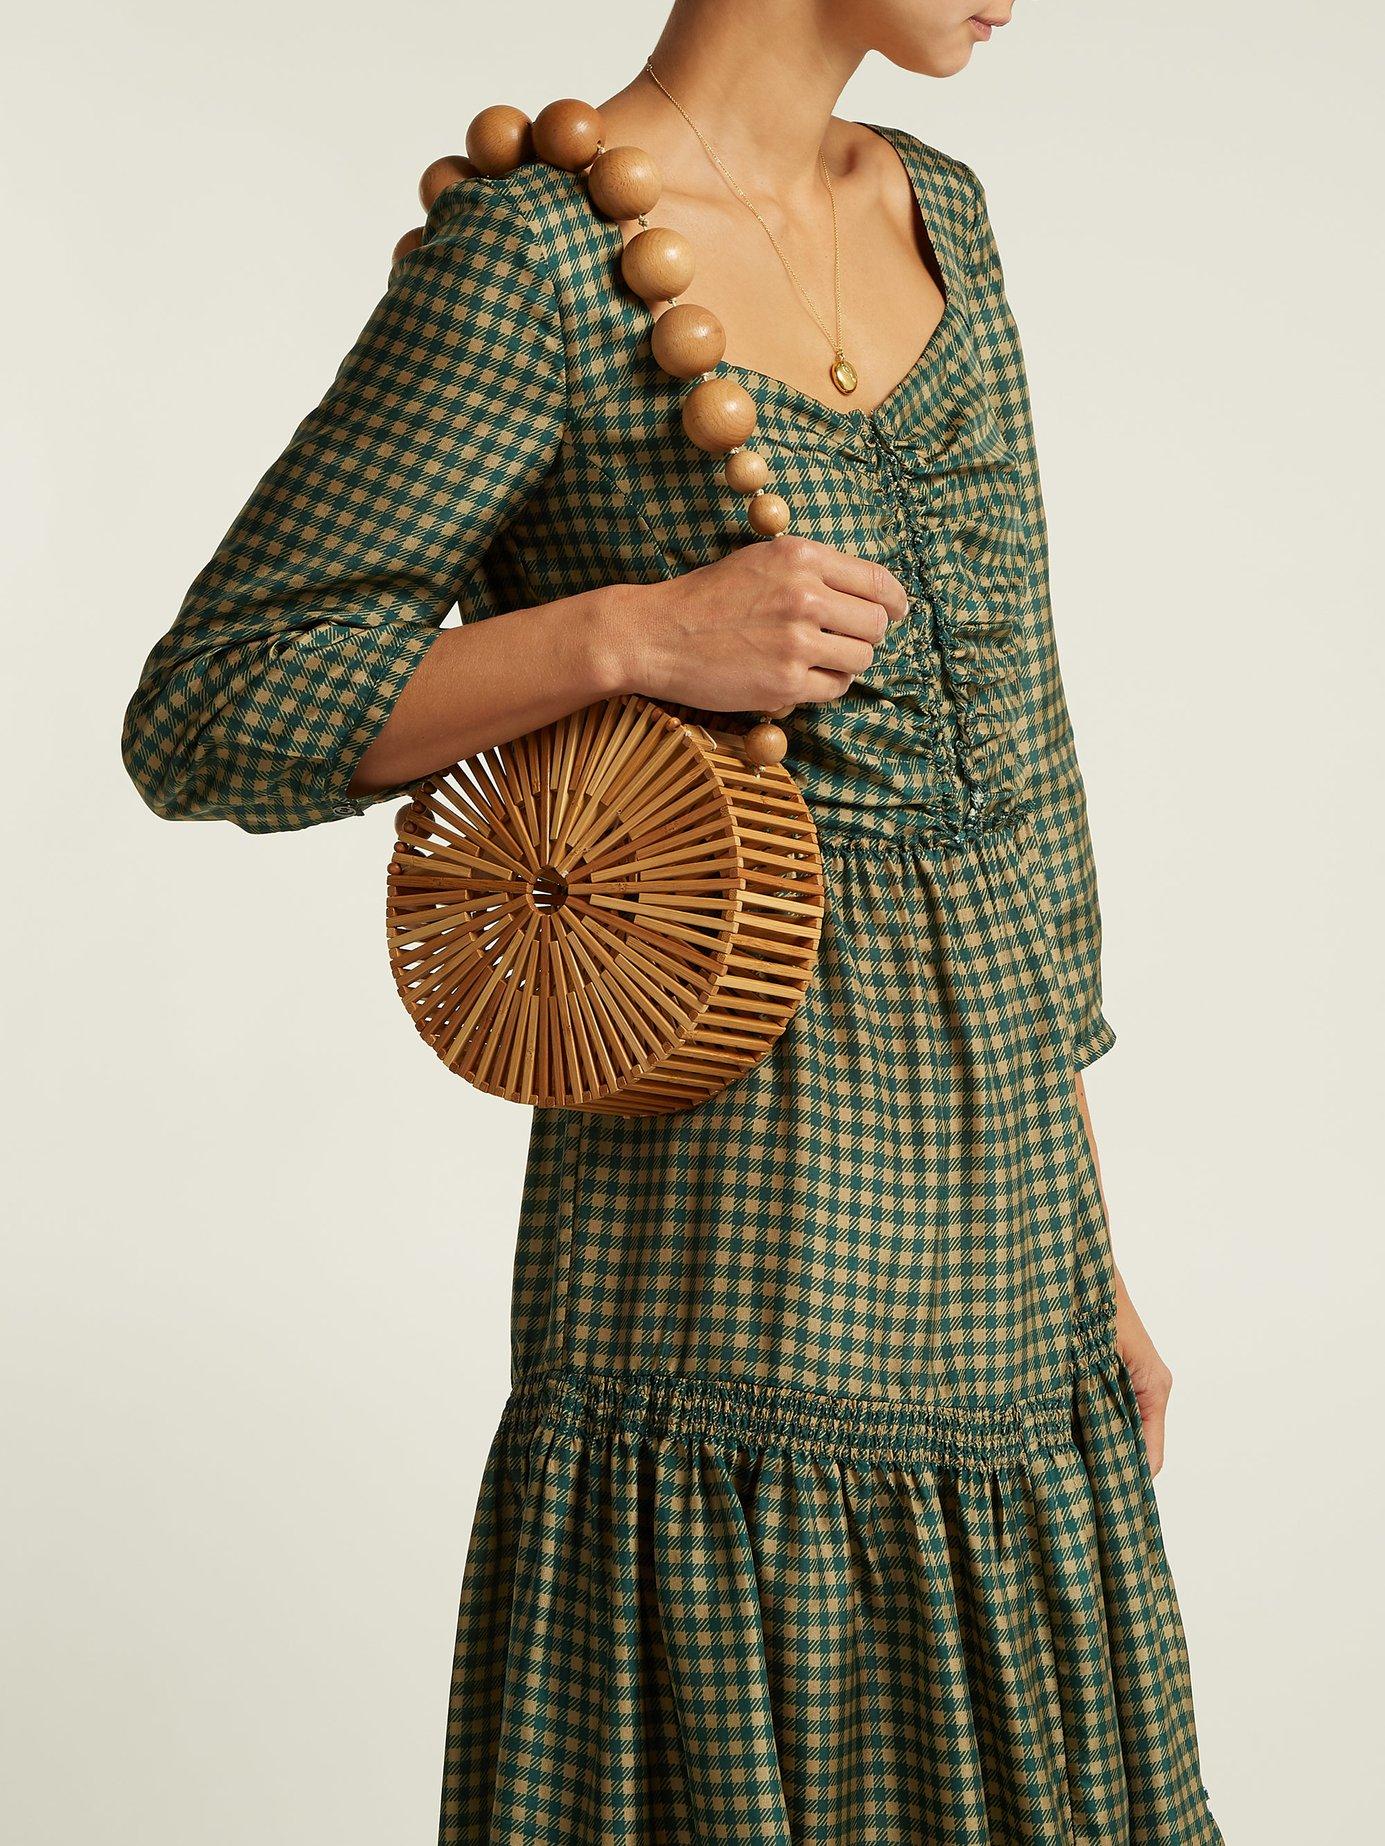 Ethno Pop tiered washed-silk midi dress by Sea